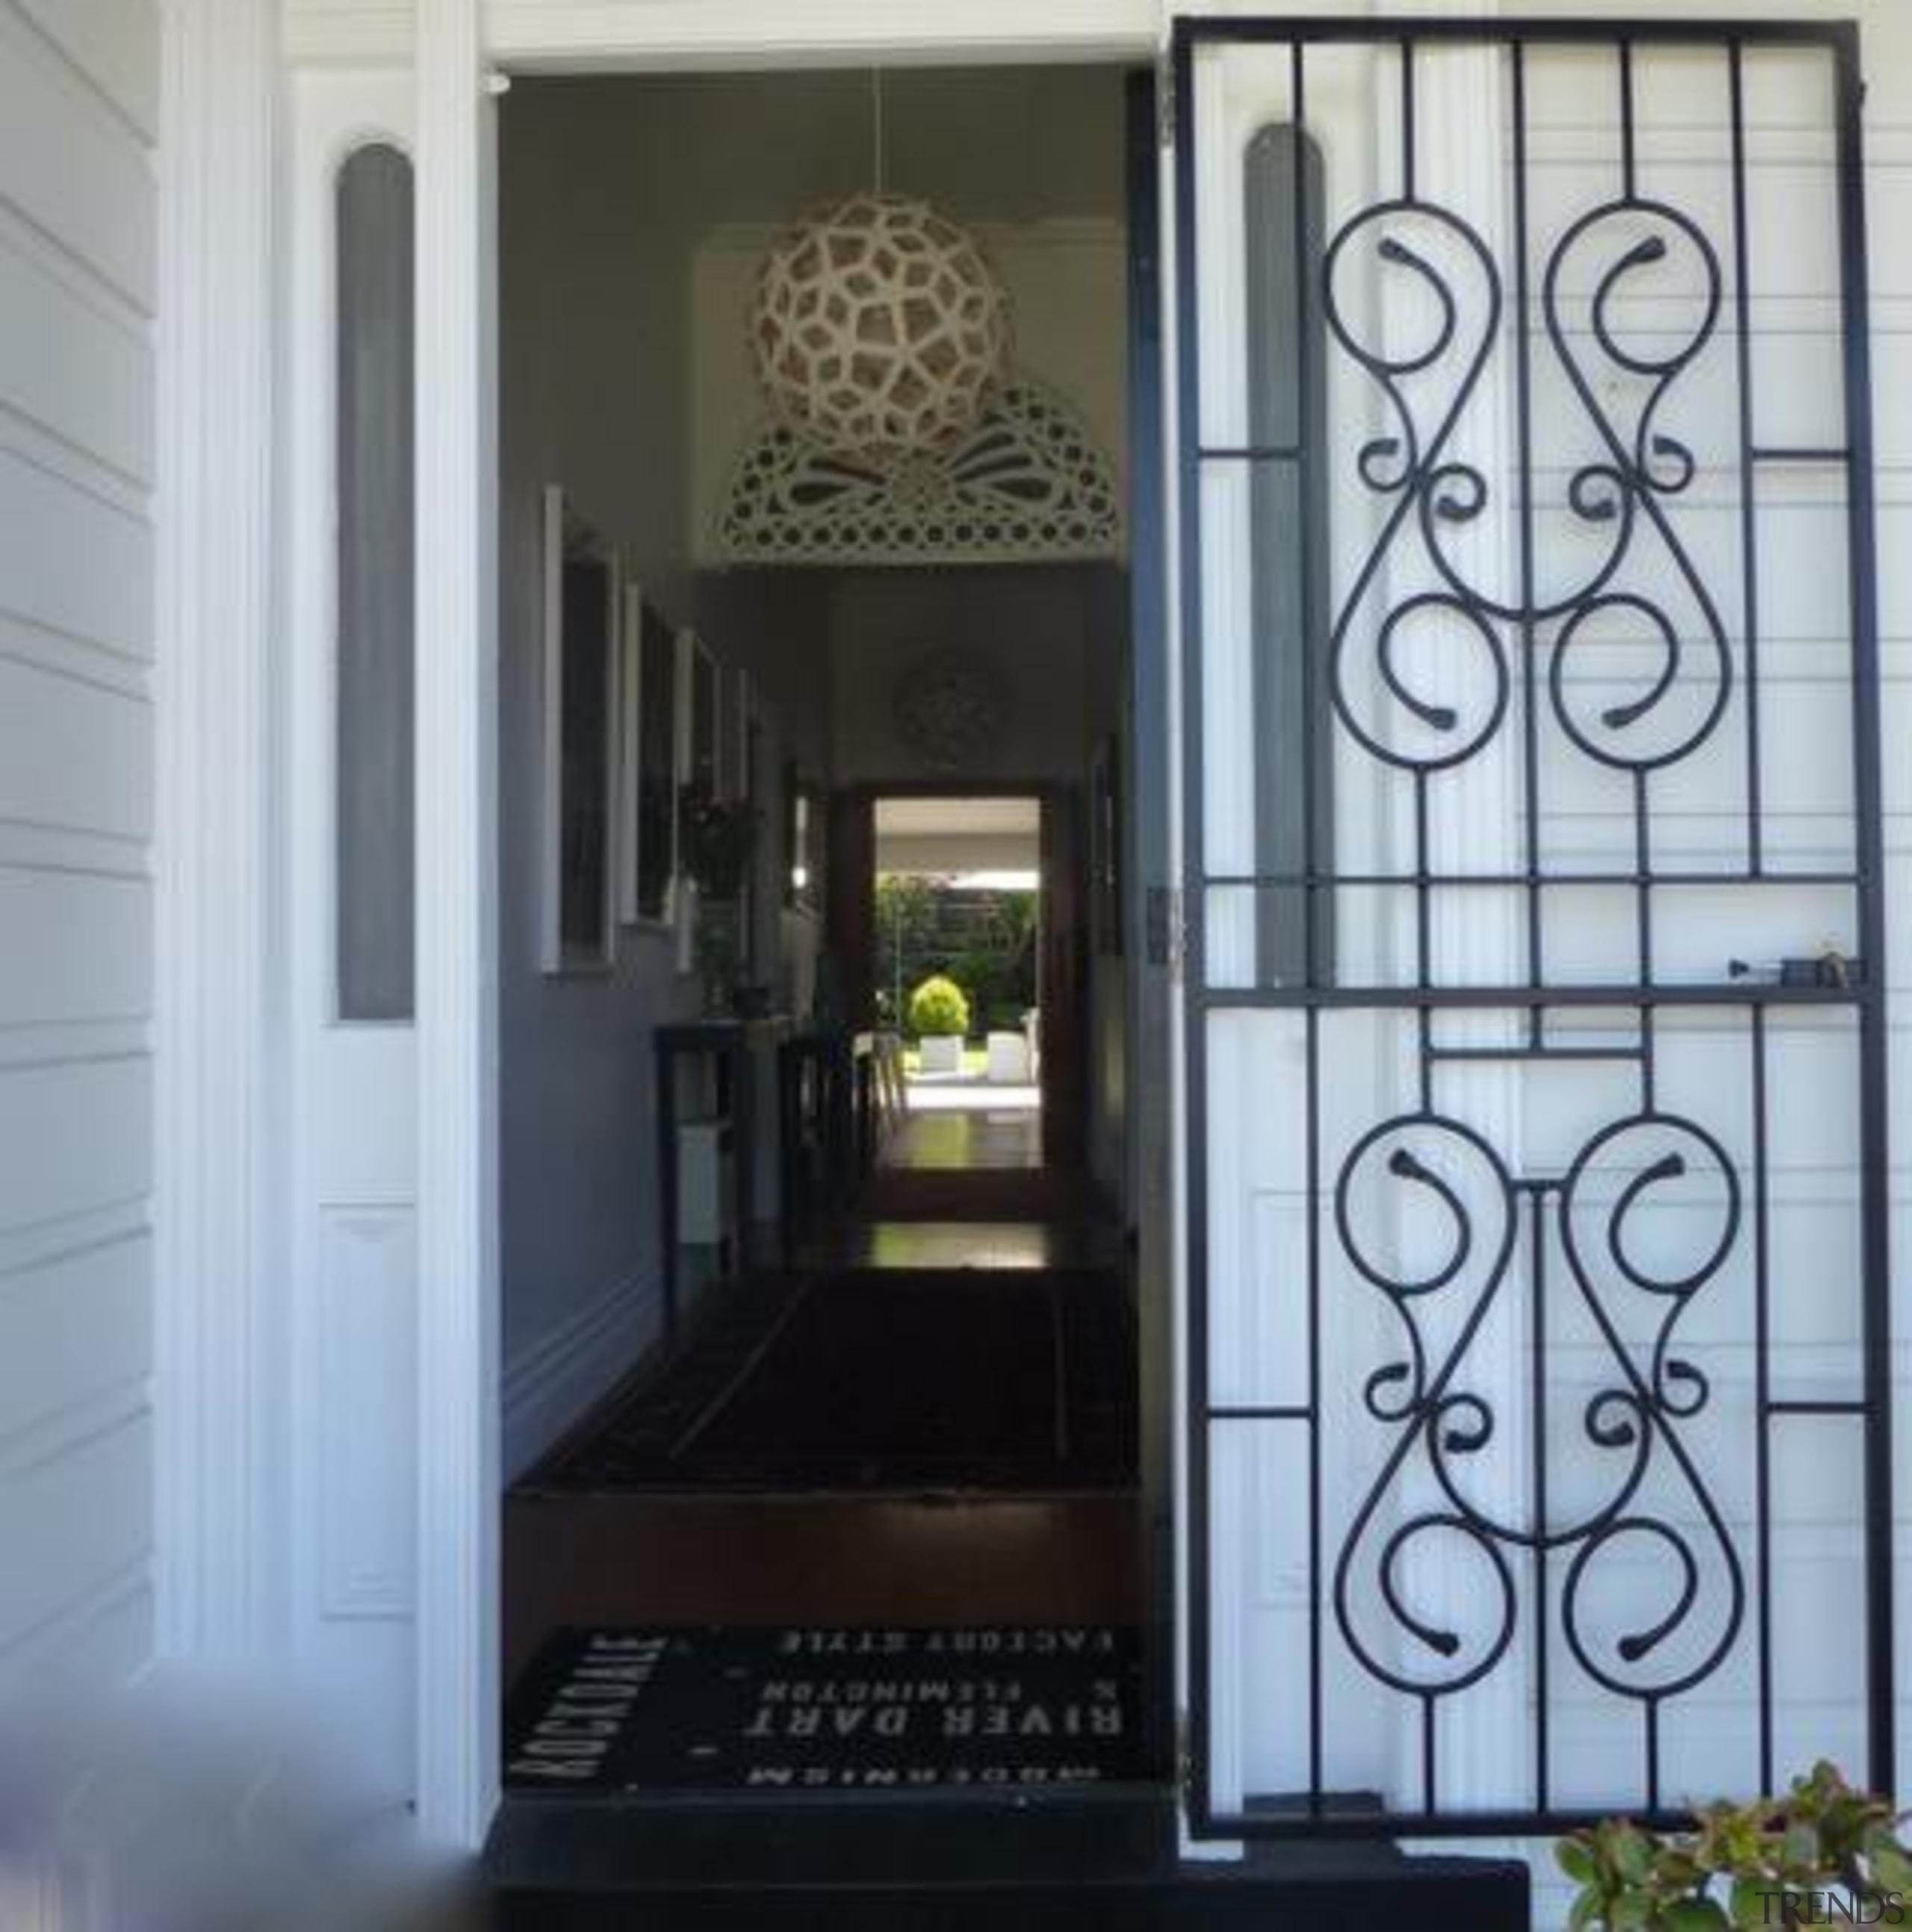 grange grey lynn.jpeg - grange_grey_lynn.jpeg - door | door, glass, iron, structure, window, gray, black